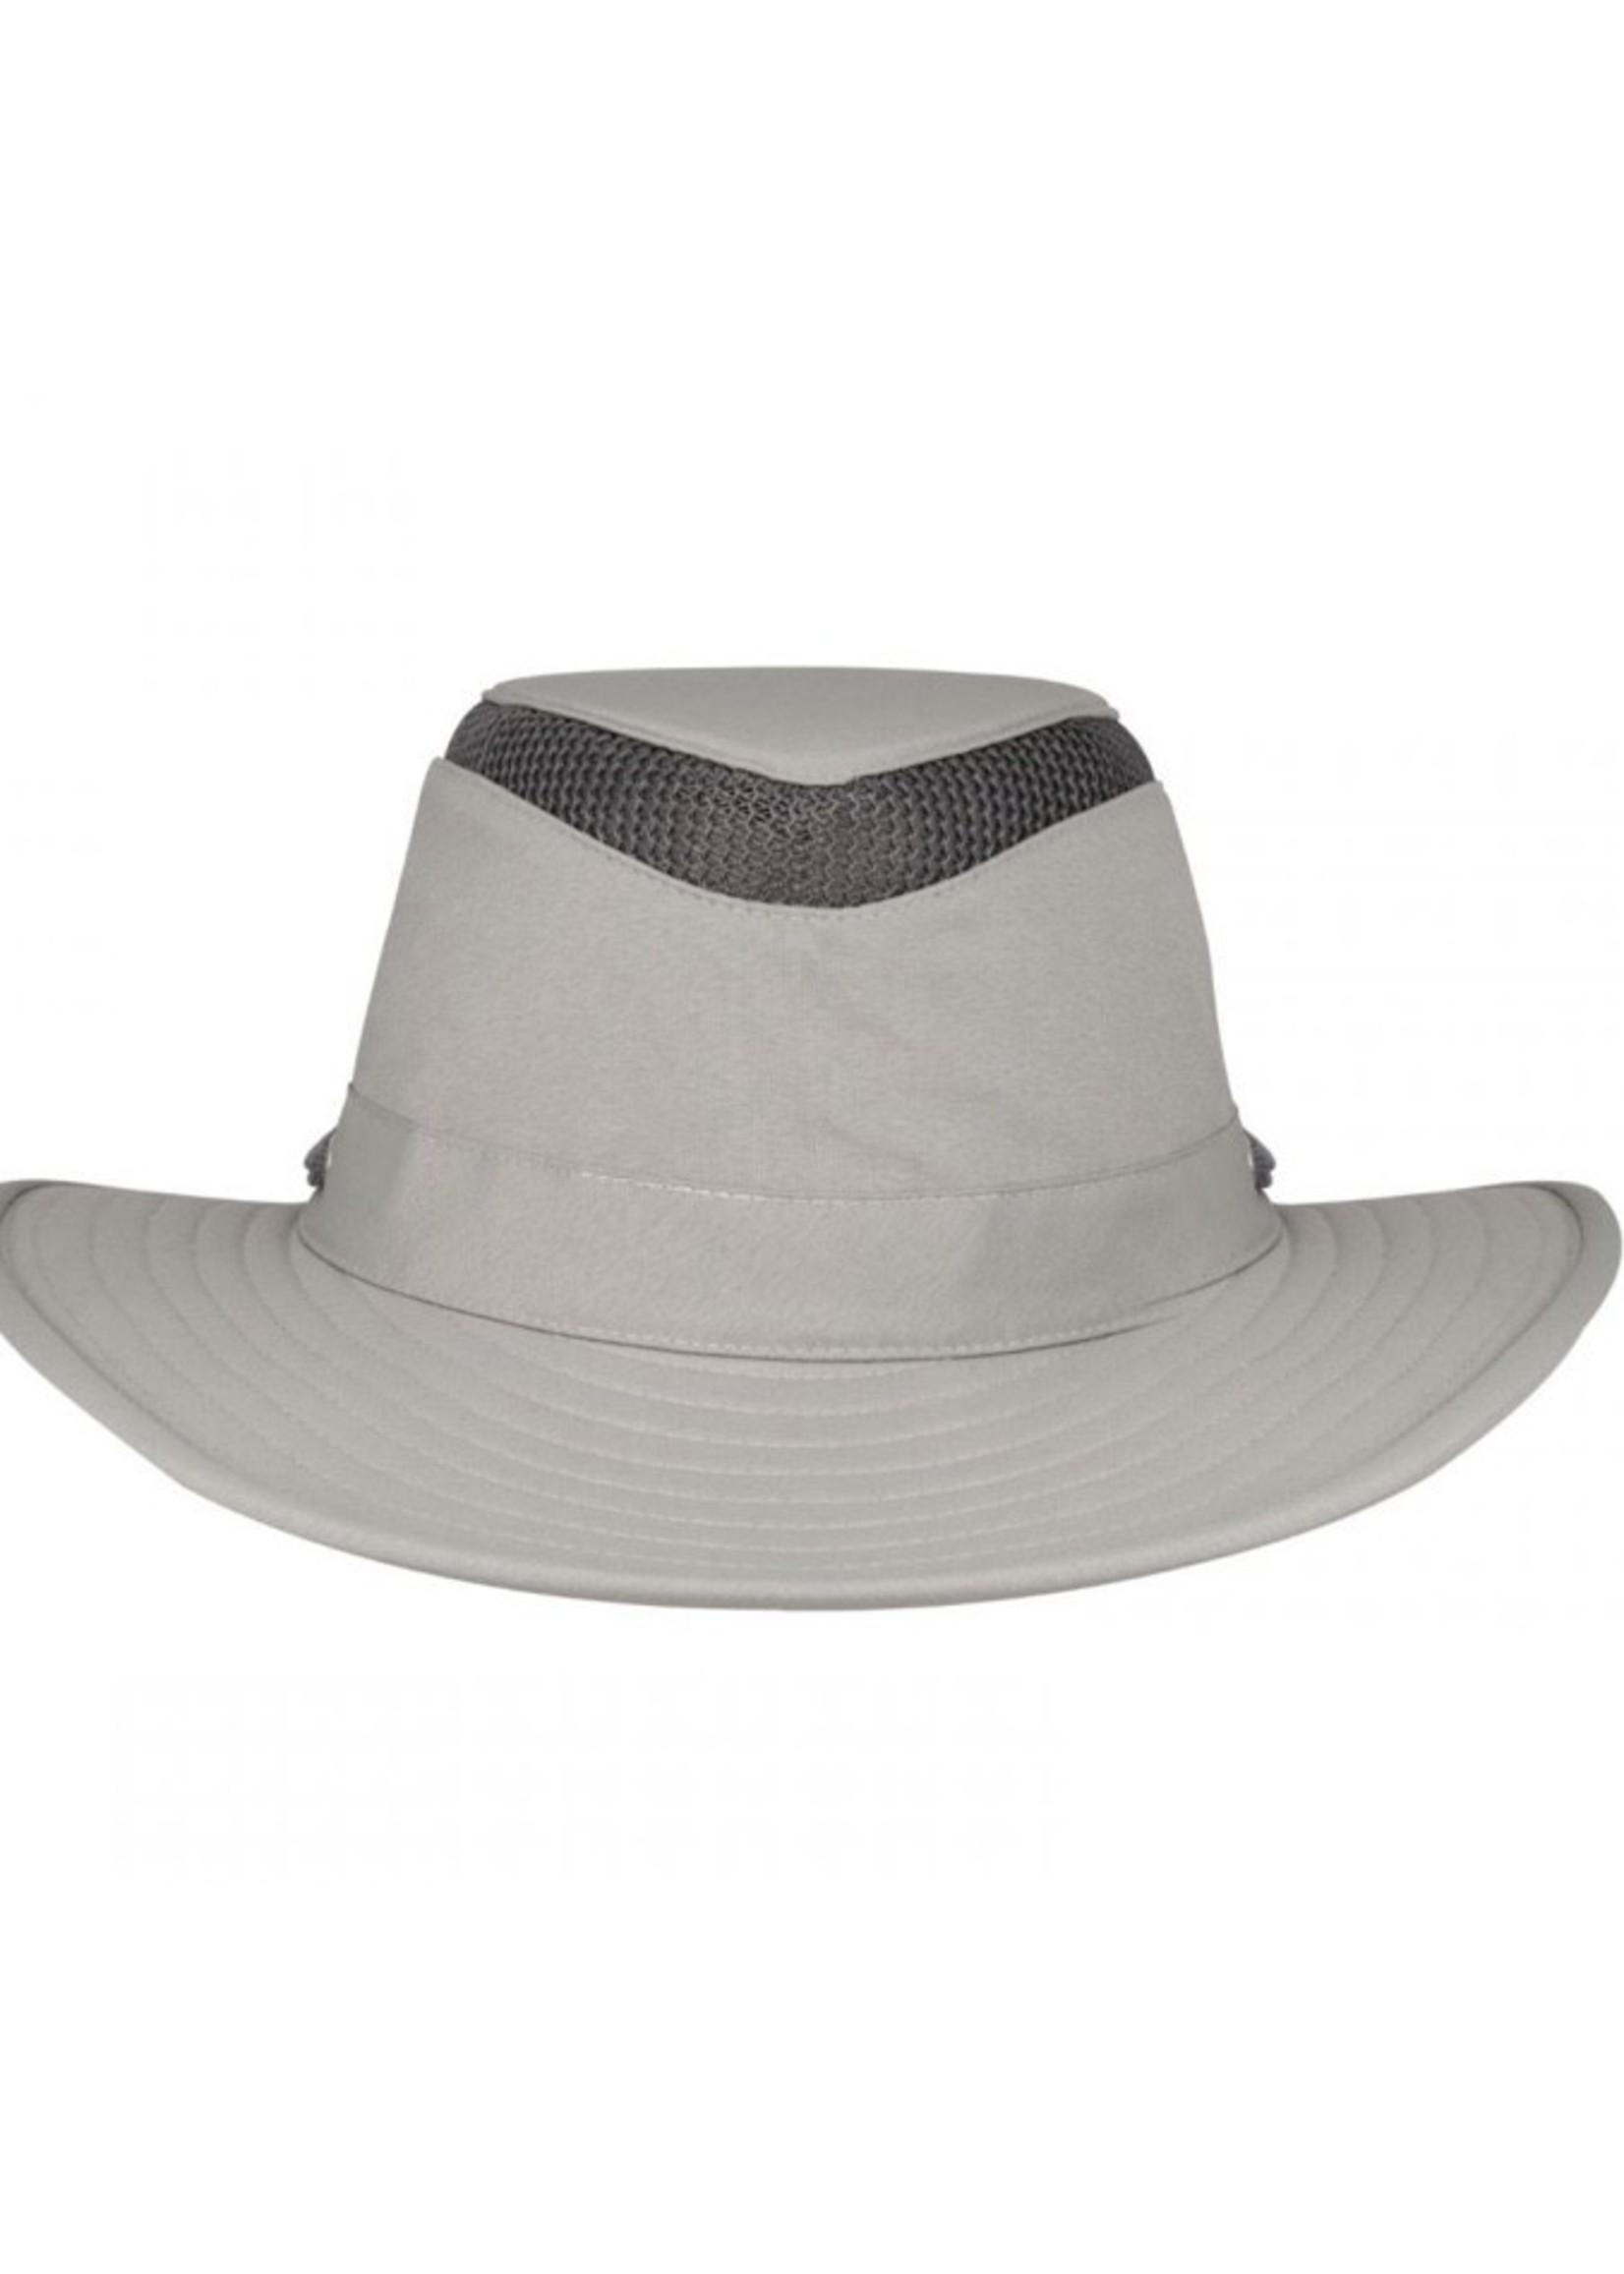 Tilley LTM6 AIRFLOW HAT